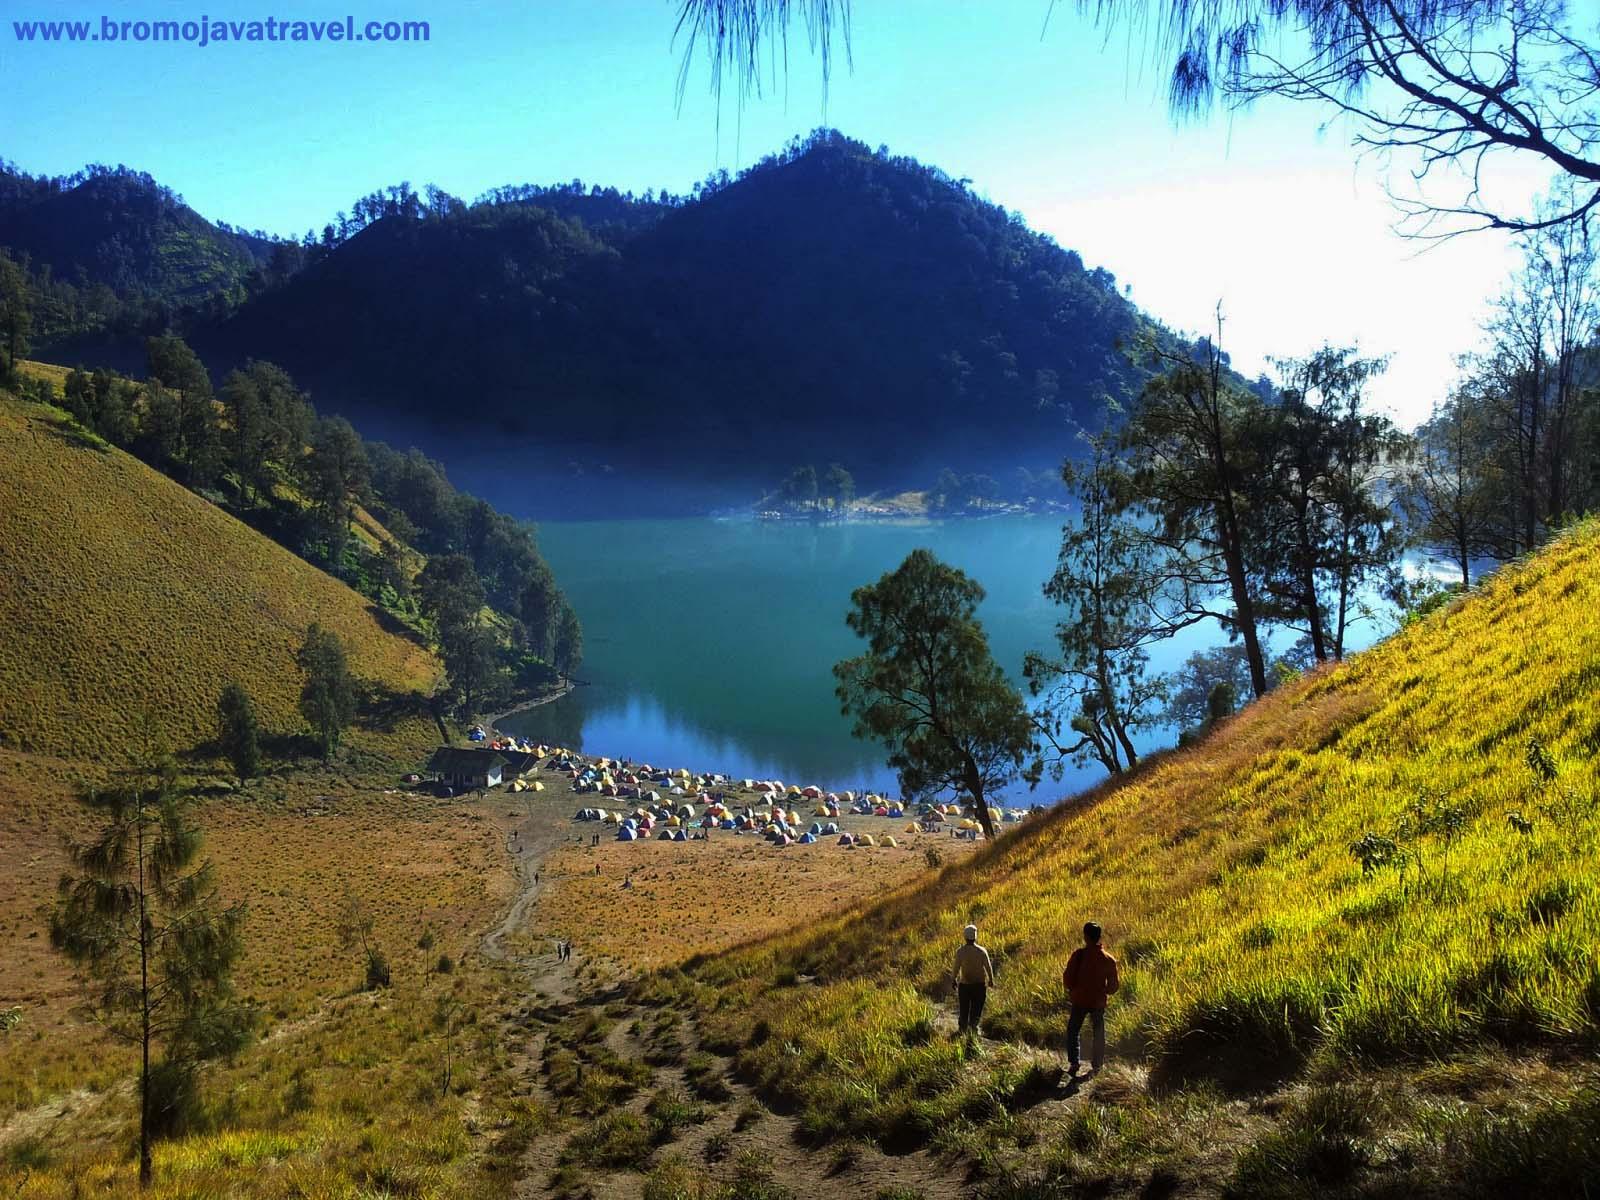 Kumbolo Lake Camping, Mt Bromo Tour Package 3 Days  Bromo Java Travel